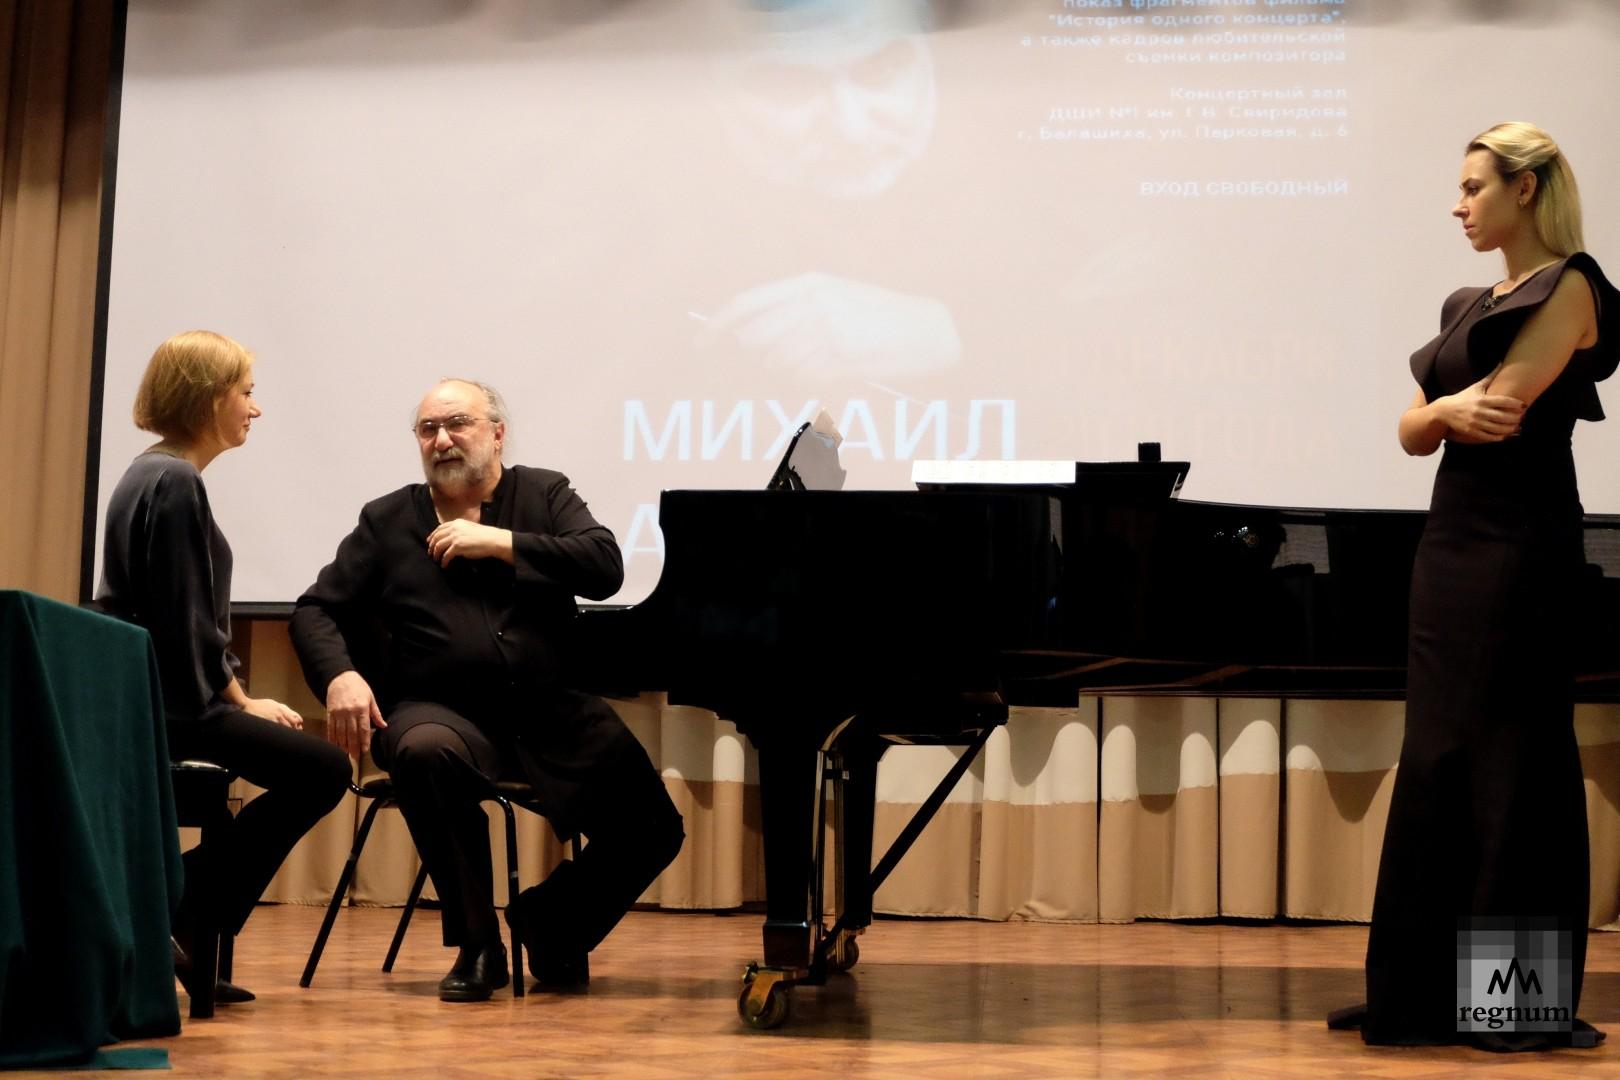 Мастер-класс от Михаила Аркадьева по исполнению произведений Г.Свиридова